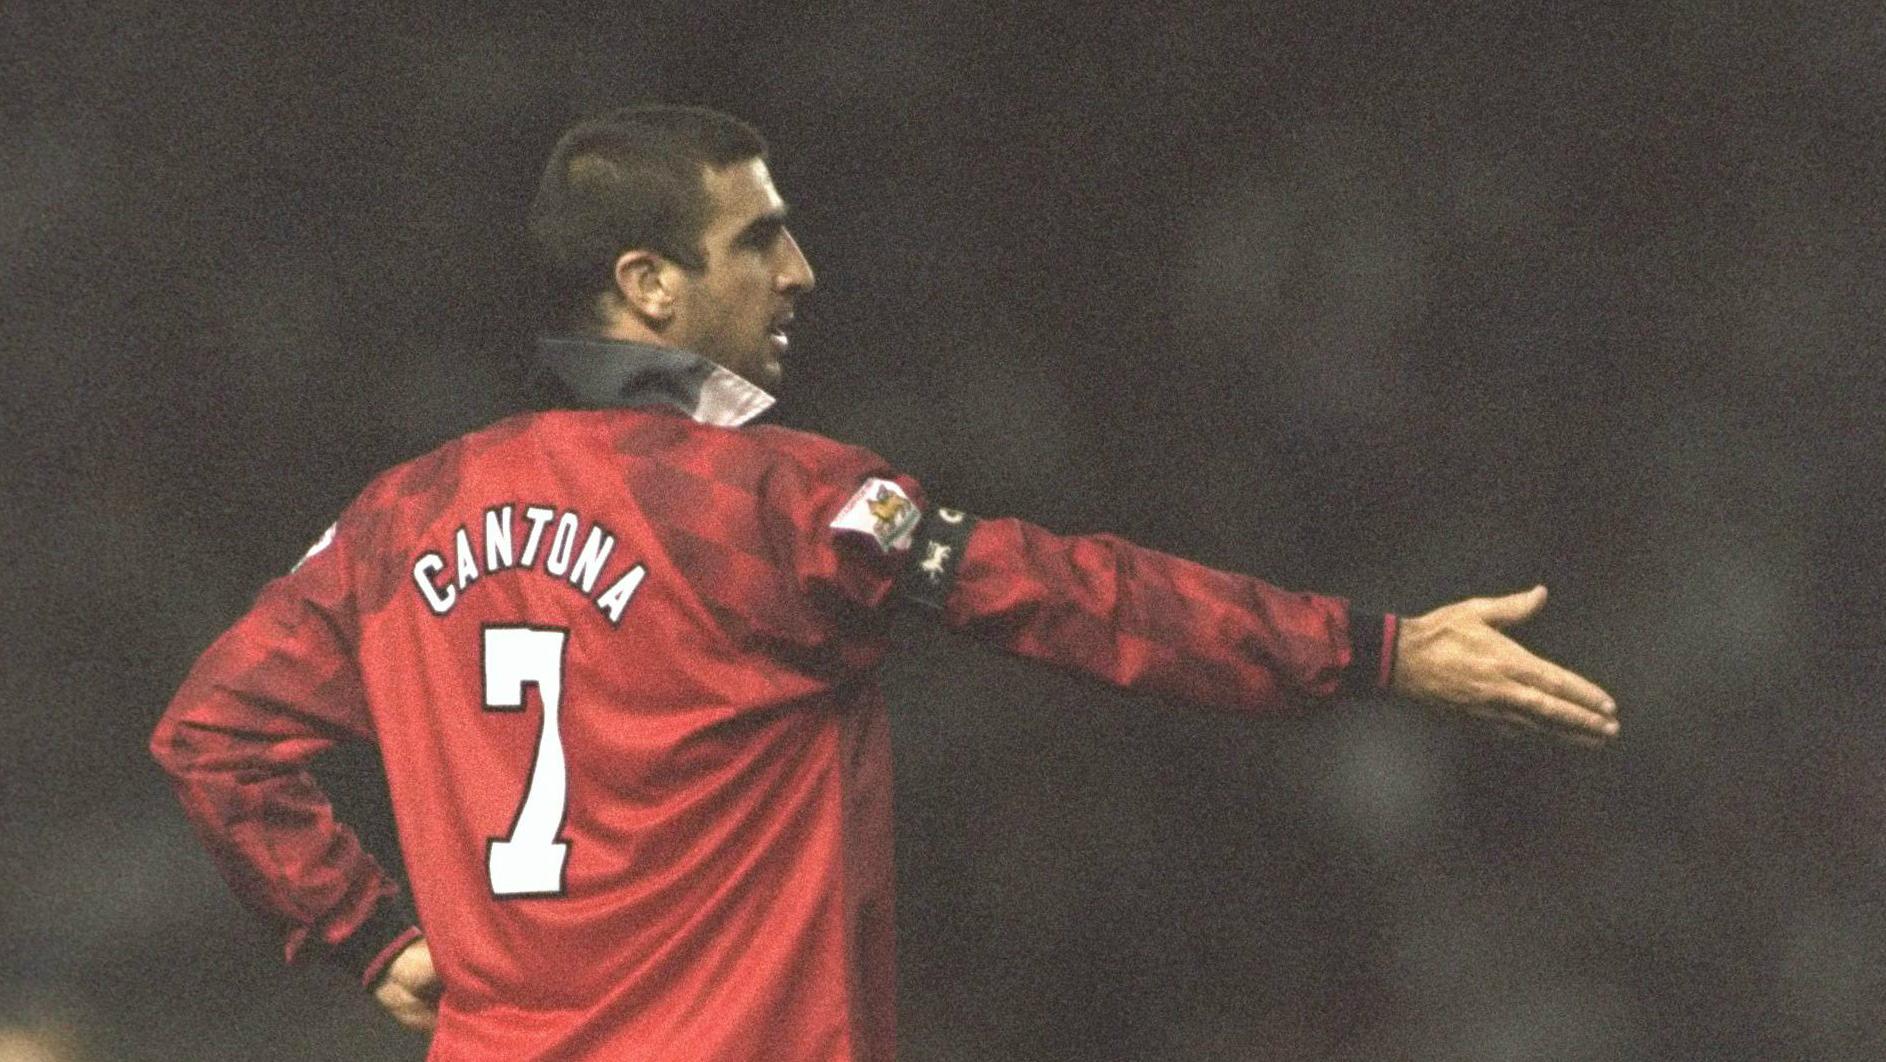 Manchester United, Cantona: